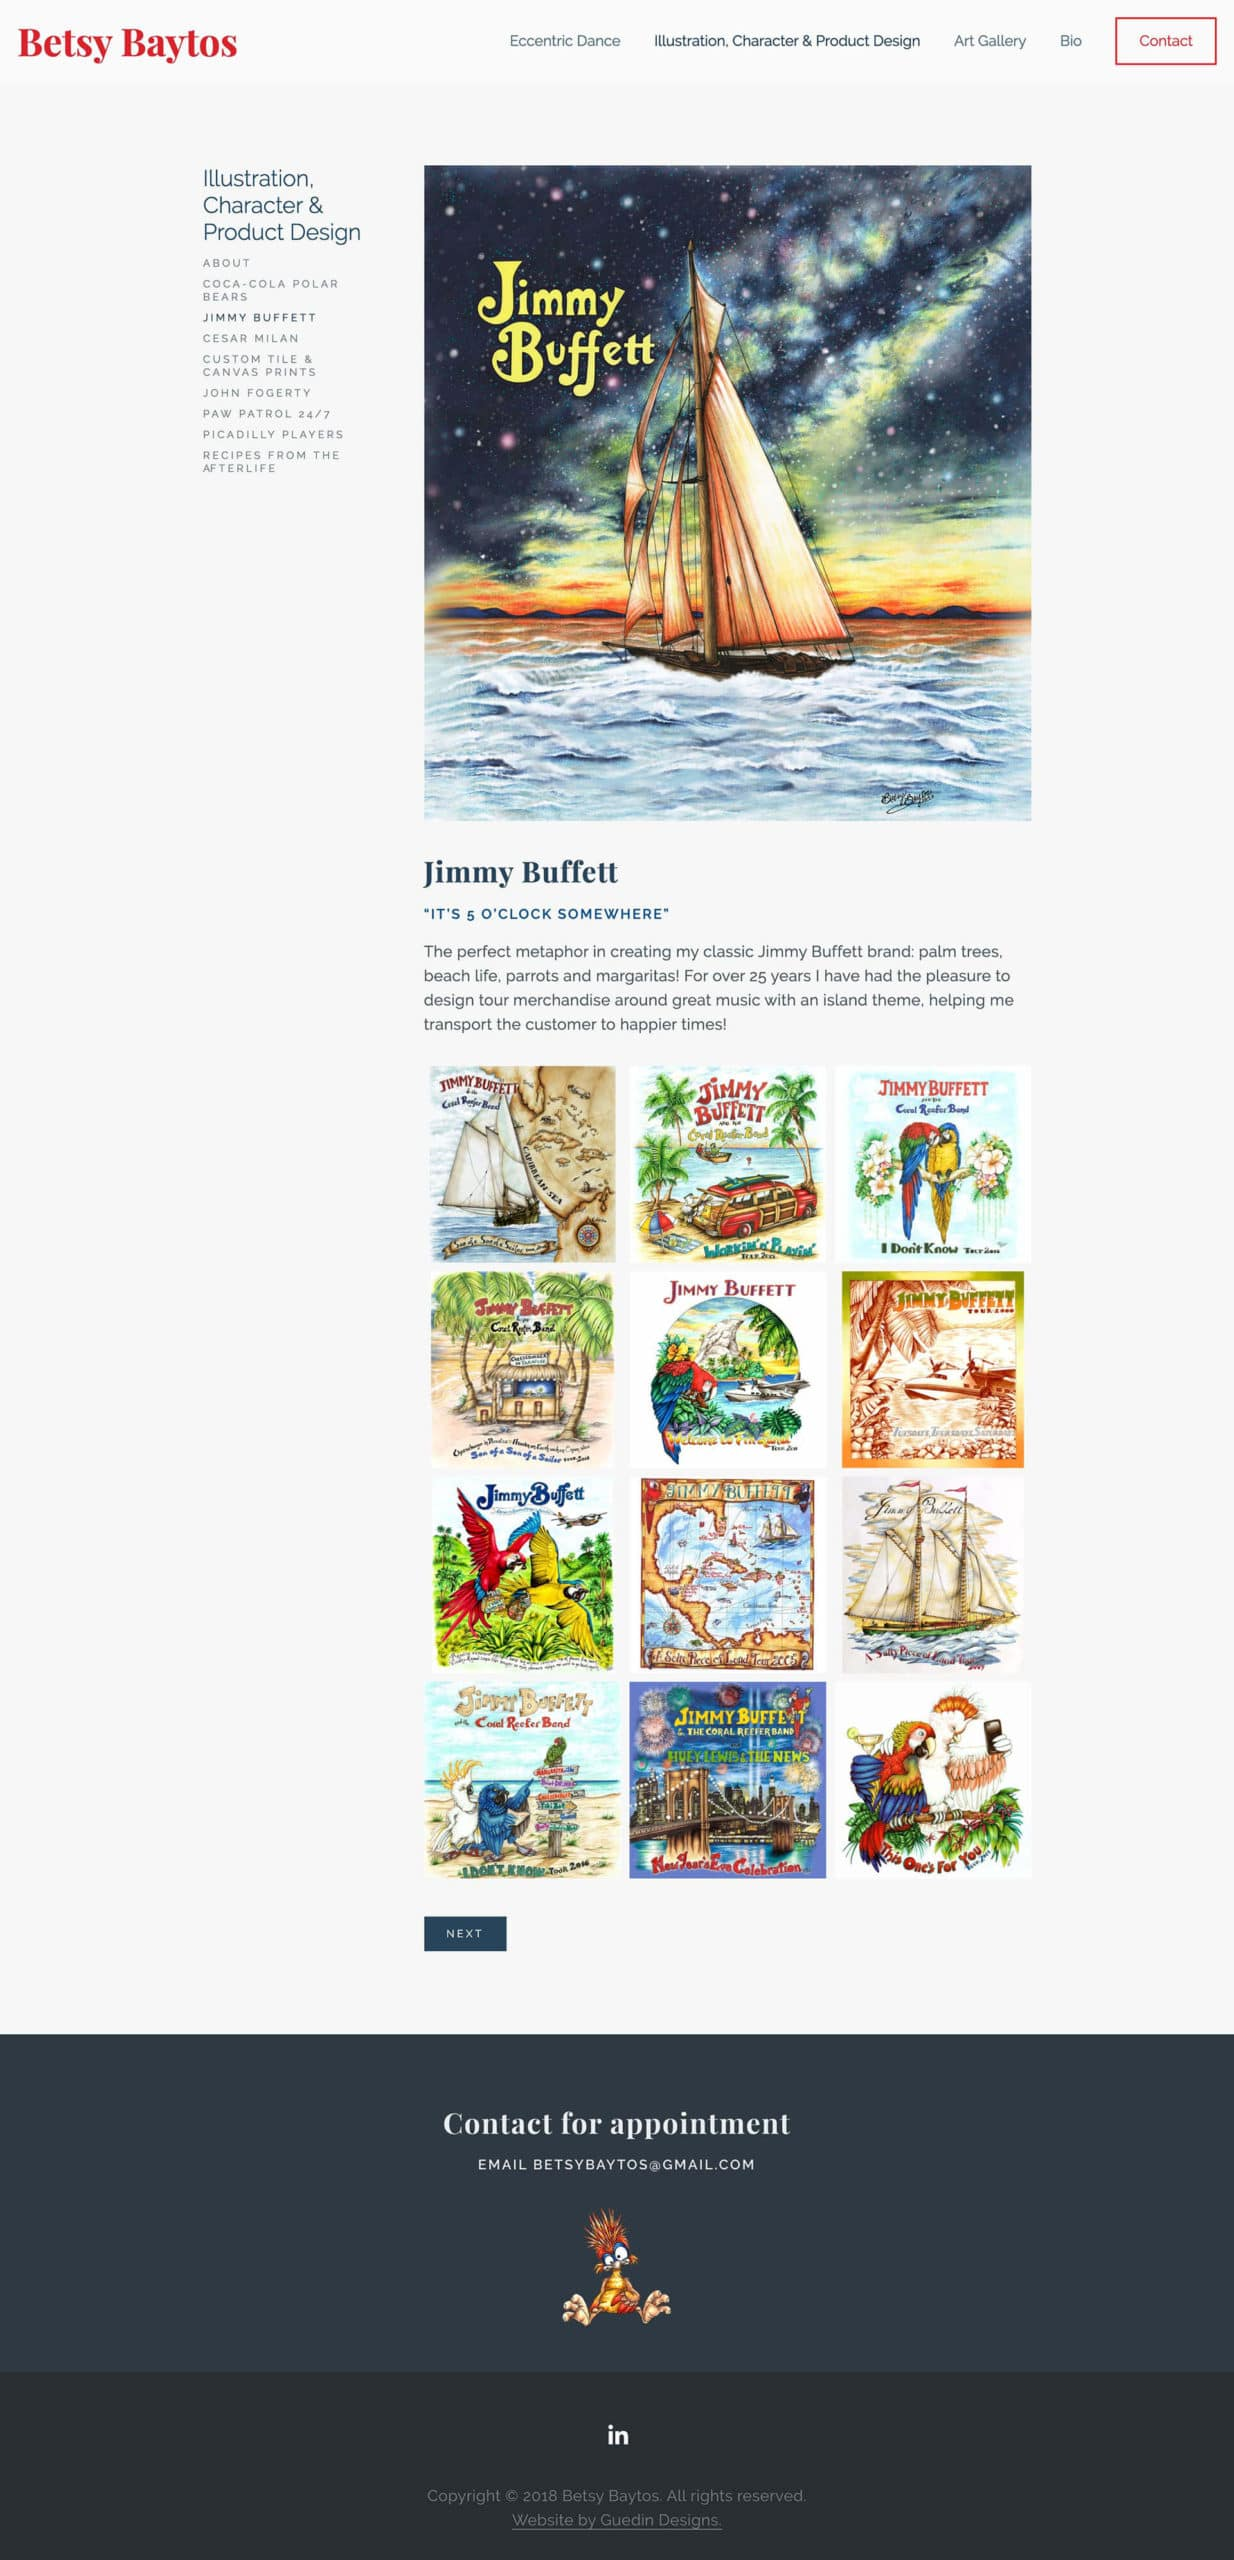 Betsy Baytos Jimmy Buffet illustration page